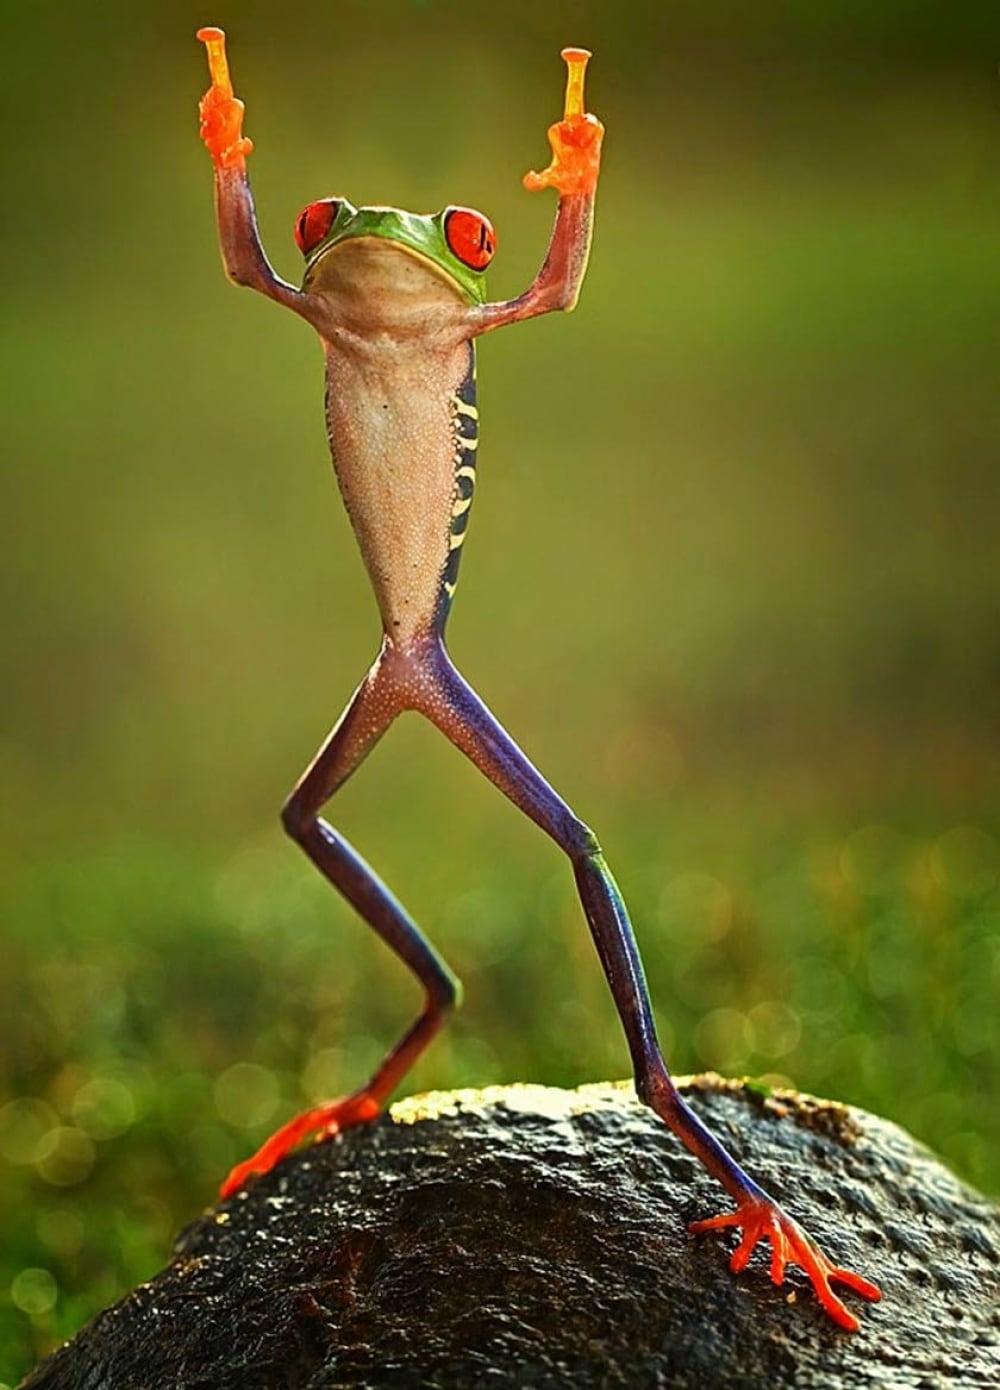 11523210-R3L8T8D-1000-0ashikhei-goh-of-indonesia-frog-flippi